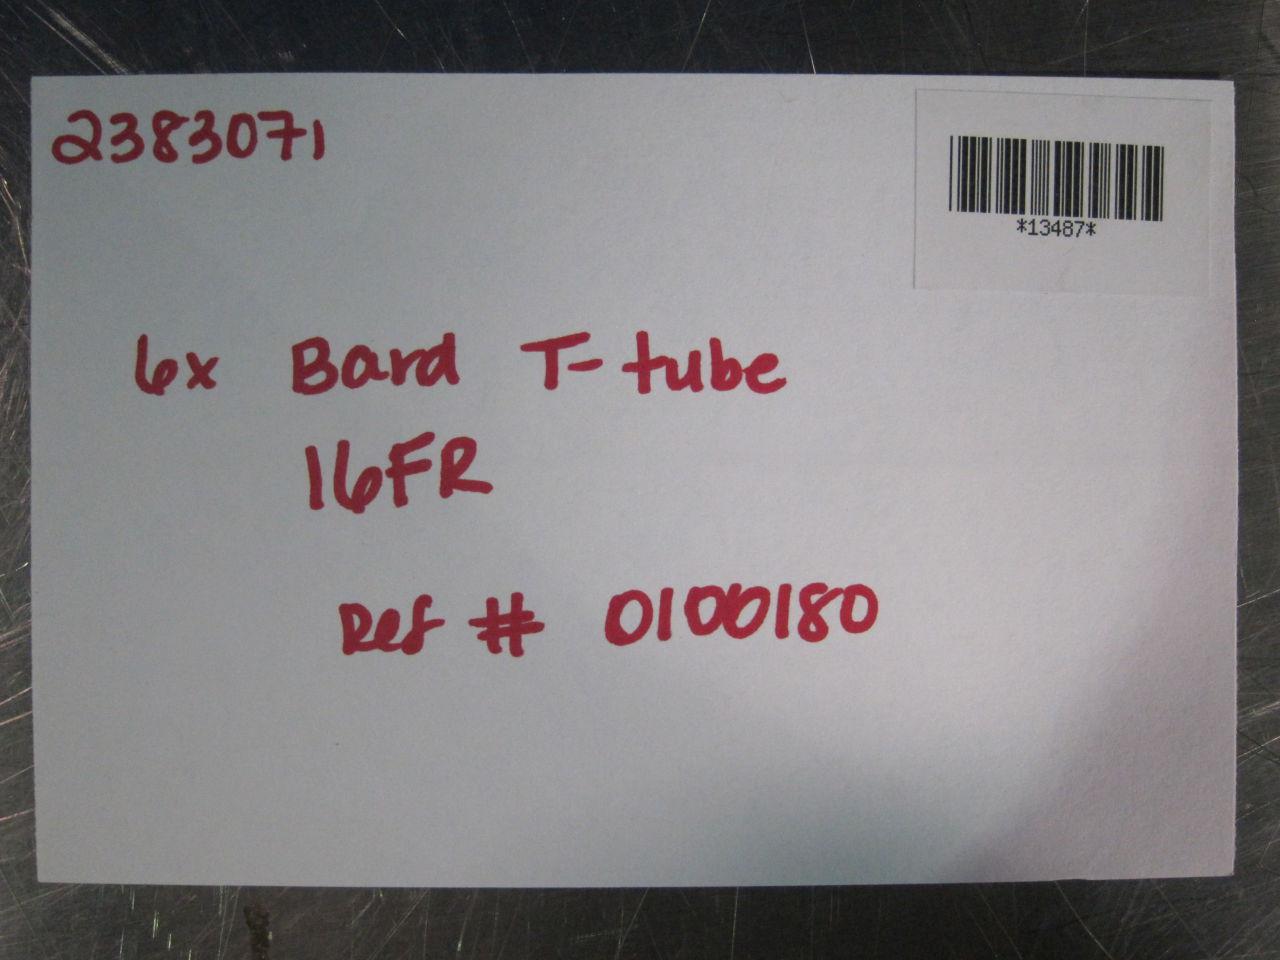 BARD 0100180 T-Tube - Lot of 6